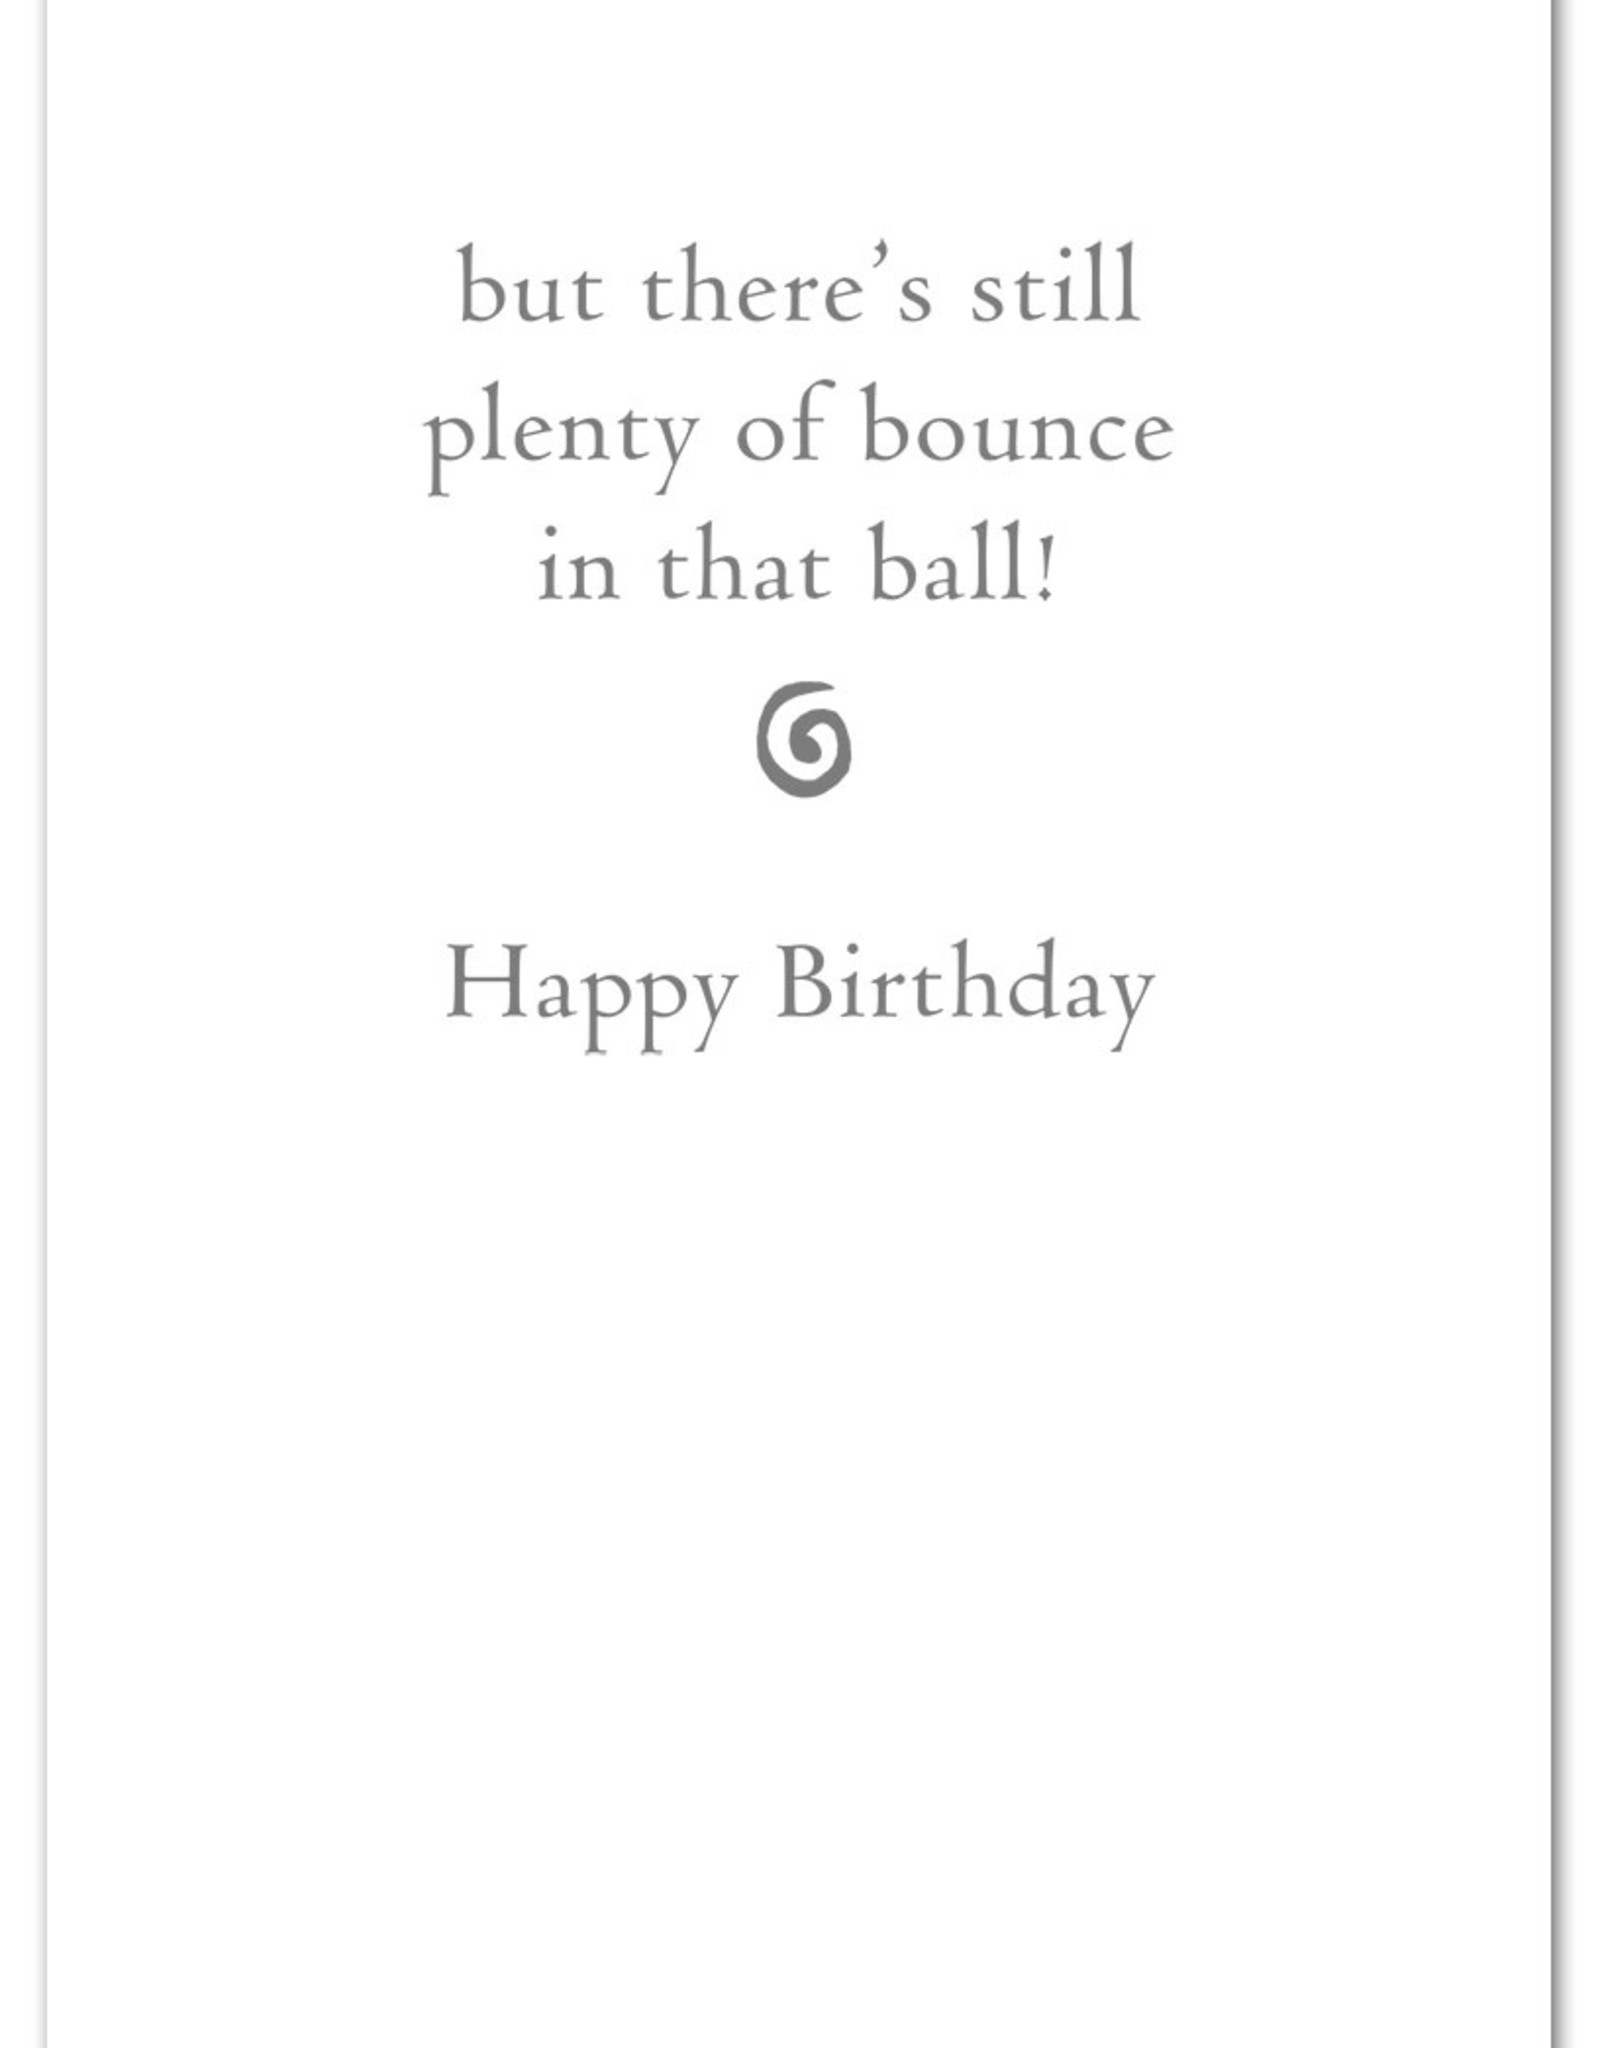 Cardthartic Cardthartic - Golden Gnawing Tennis Ball Birthday Card